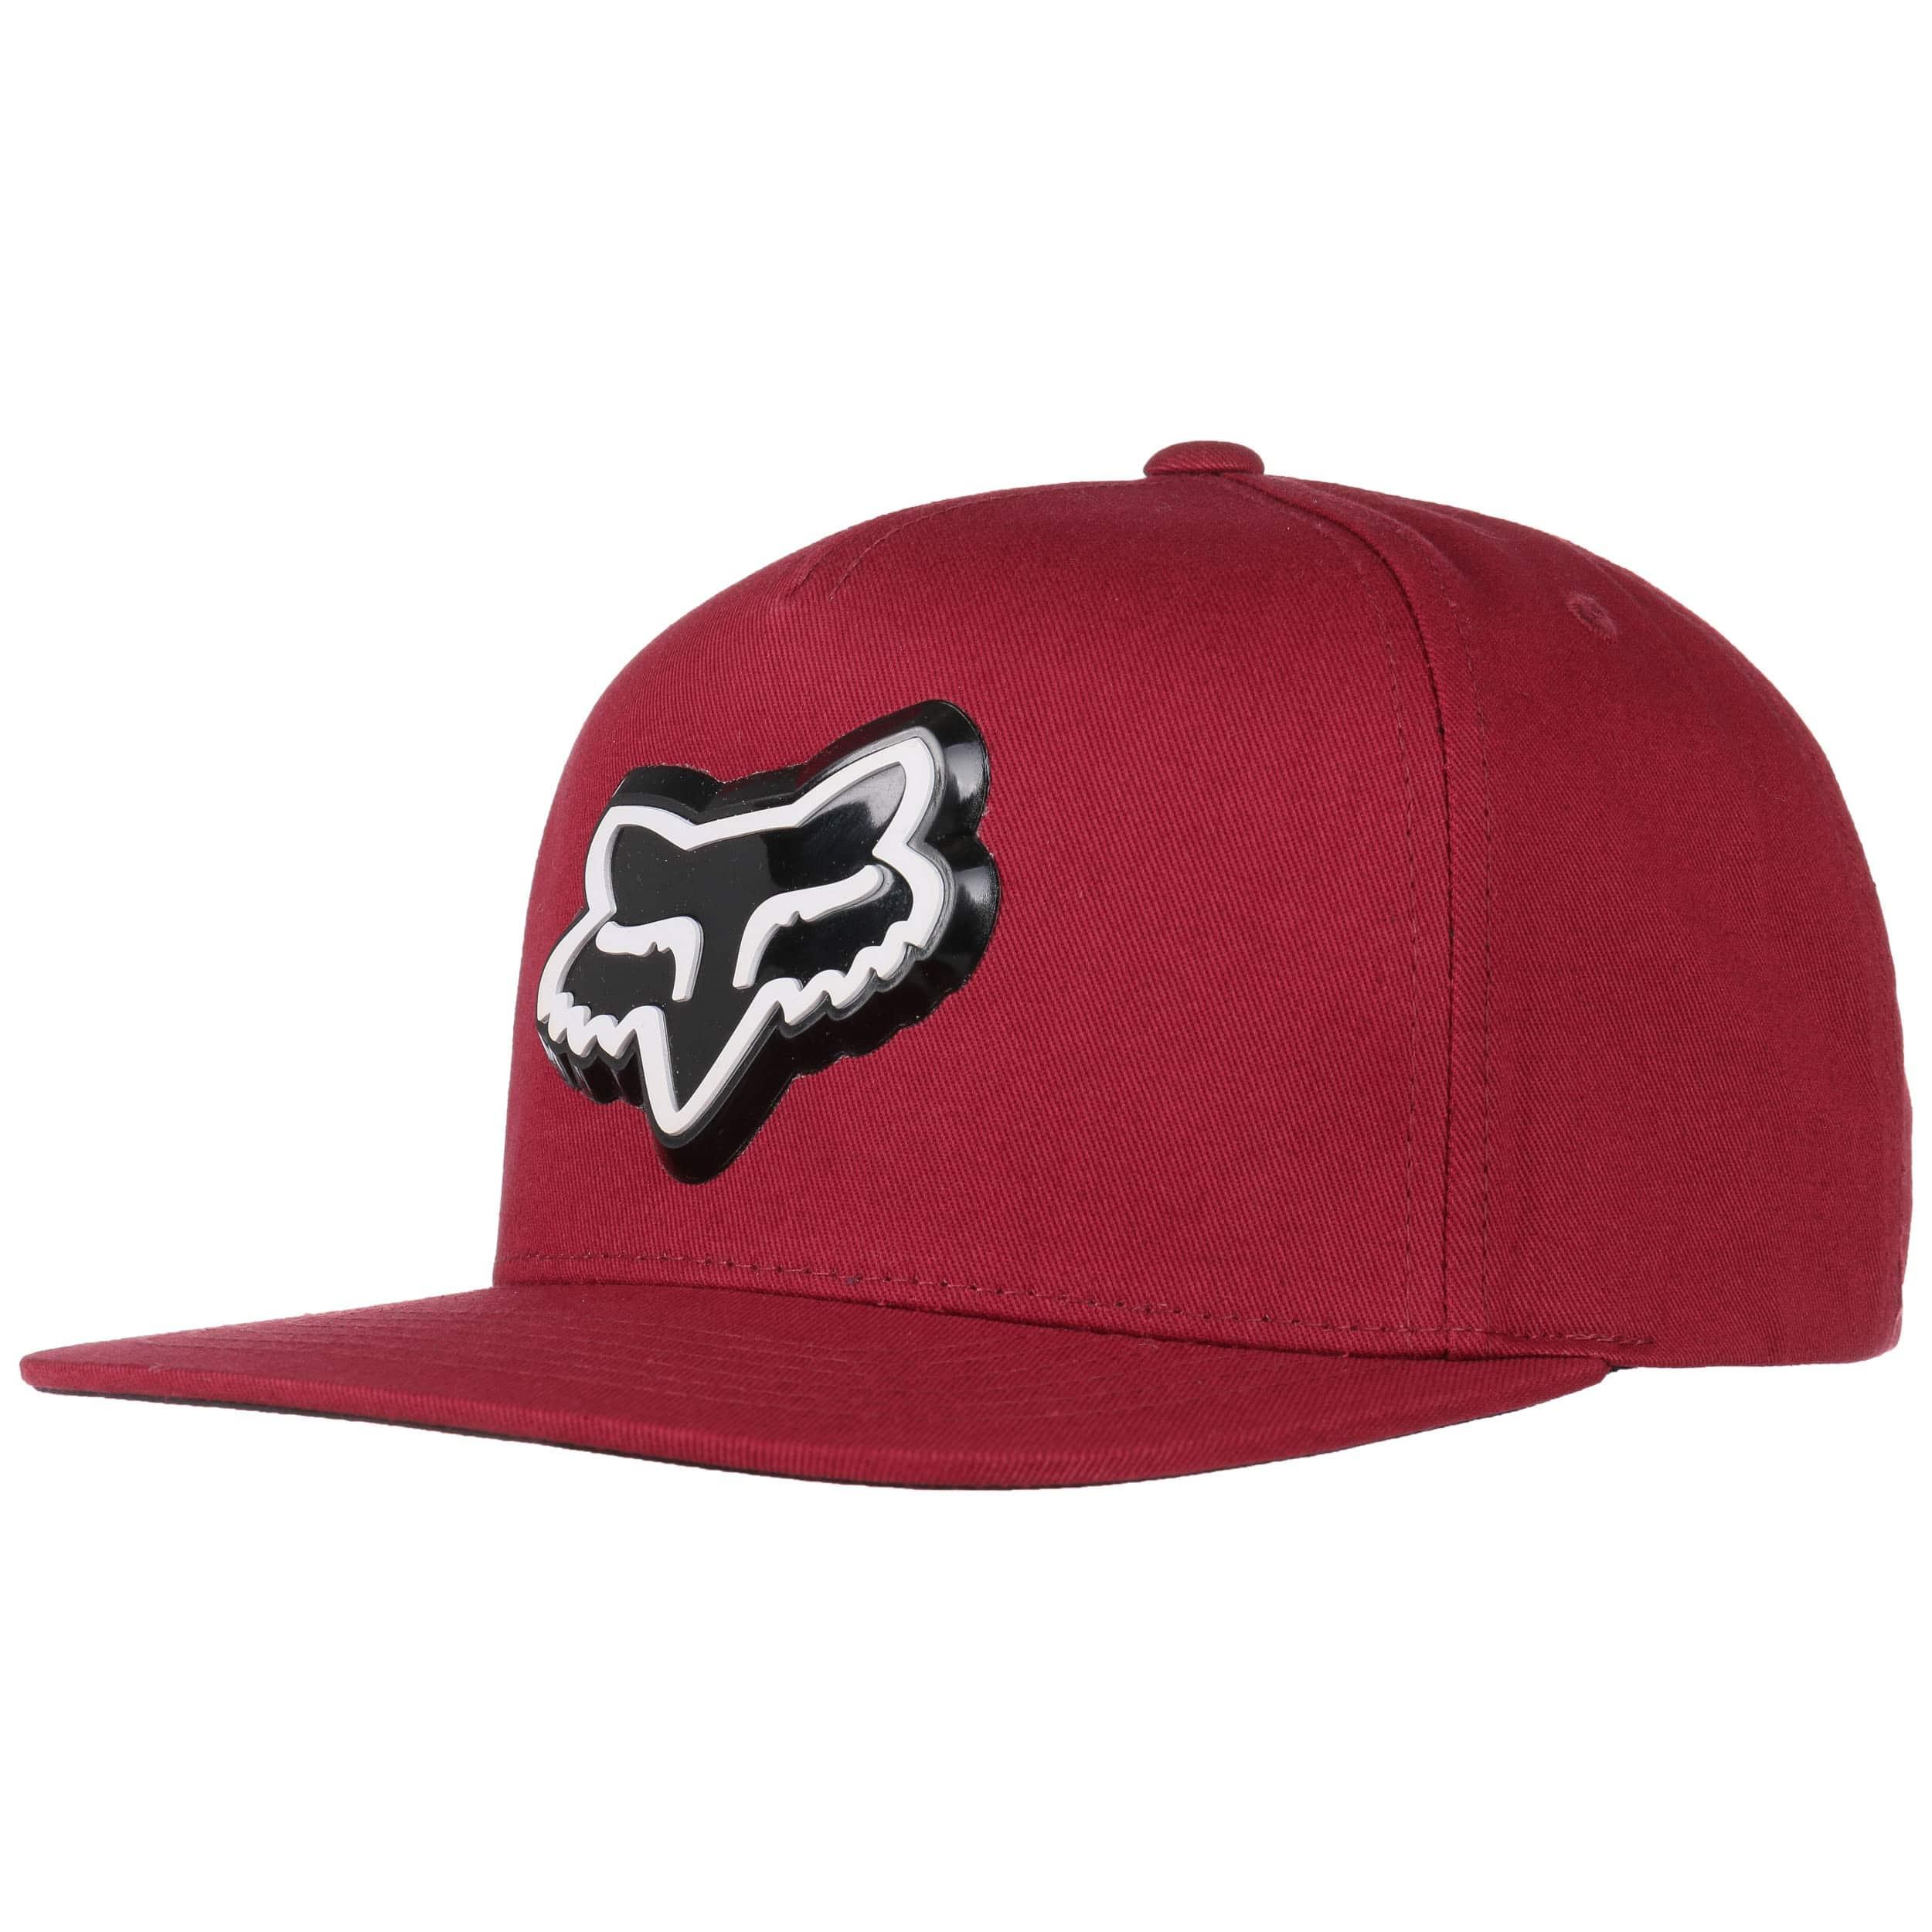 Gorra Ingratiate Snapback by FOX - Gorras - sombreroshop.es 74b2cb42a2a